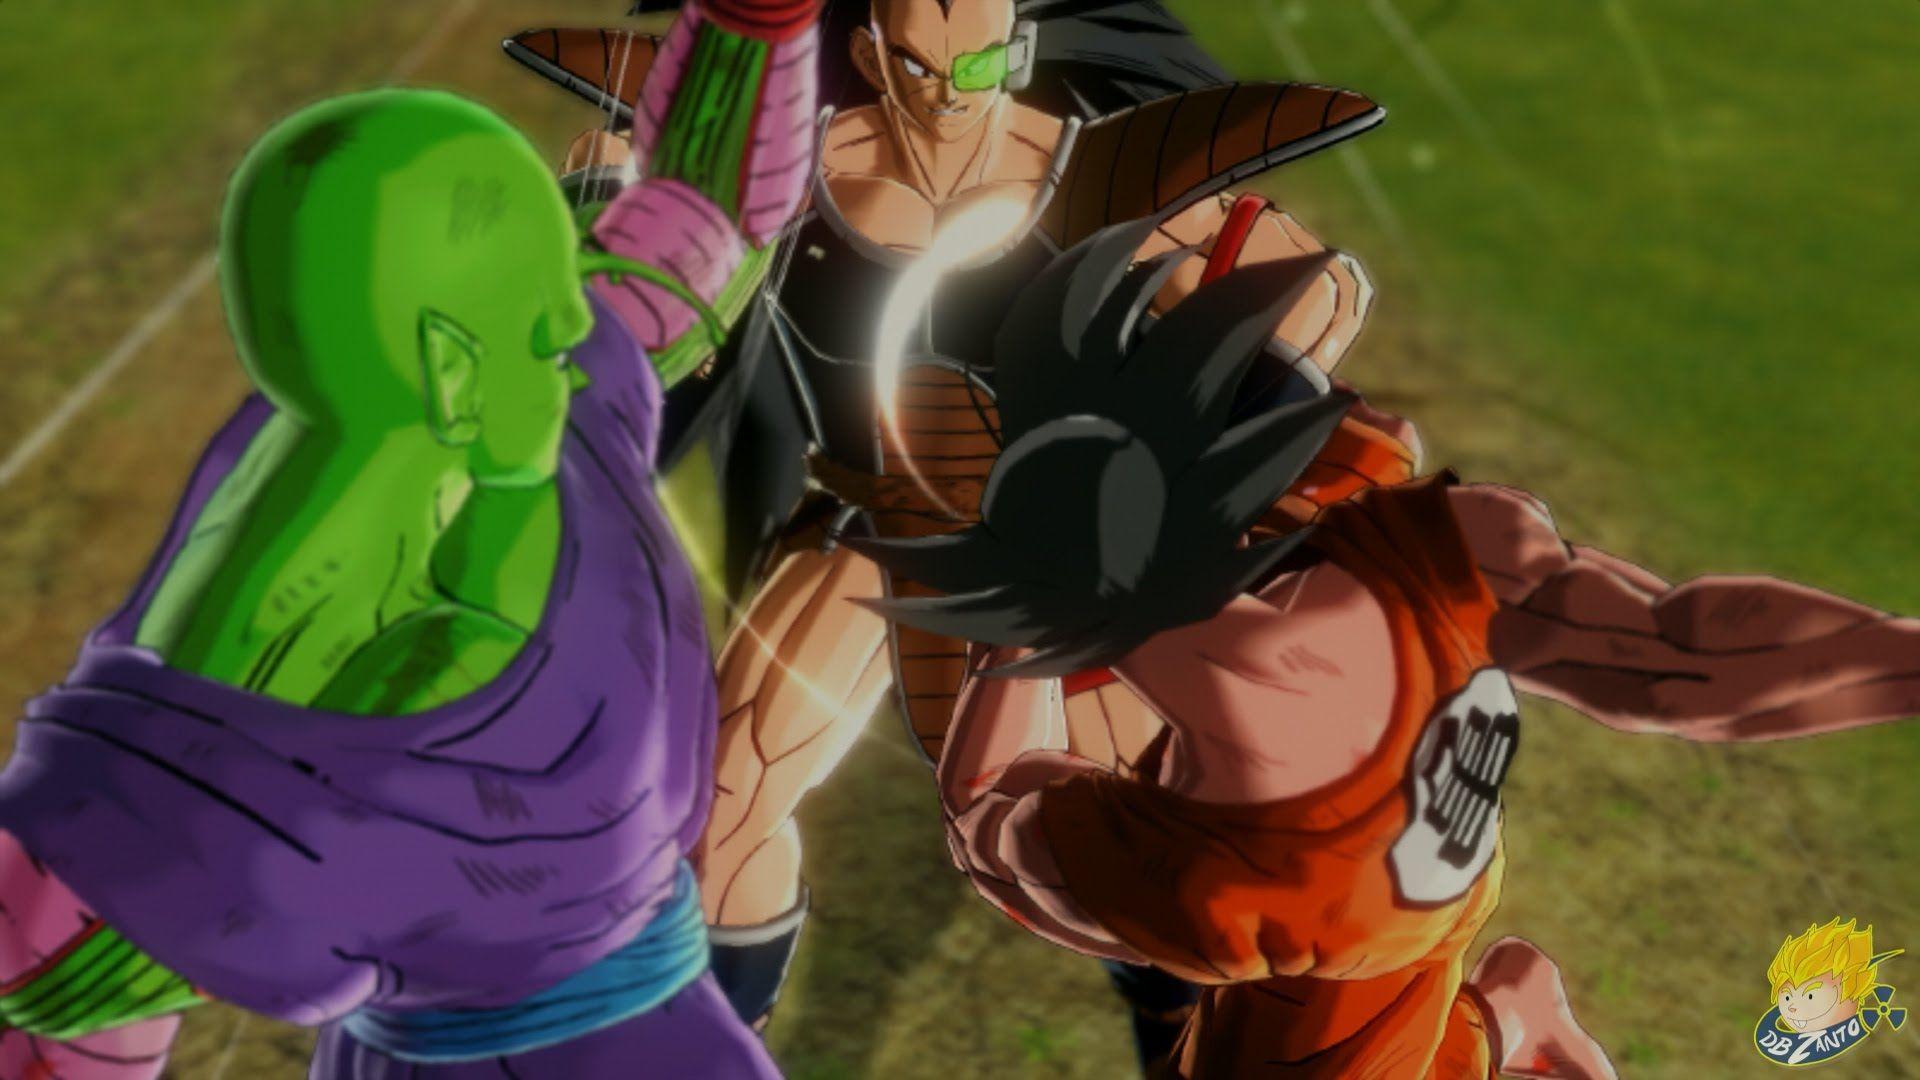 Dragon Ball Xenoverse Goku Piccolo Vs Villainous Raditz Storymode Cu Dragon Ball Dragon Saiyan